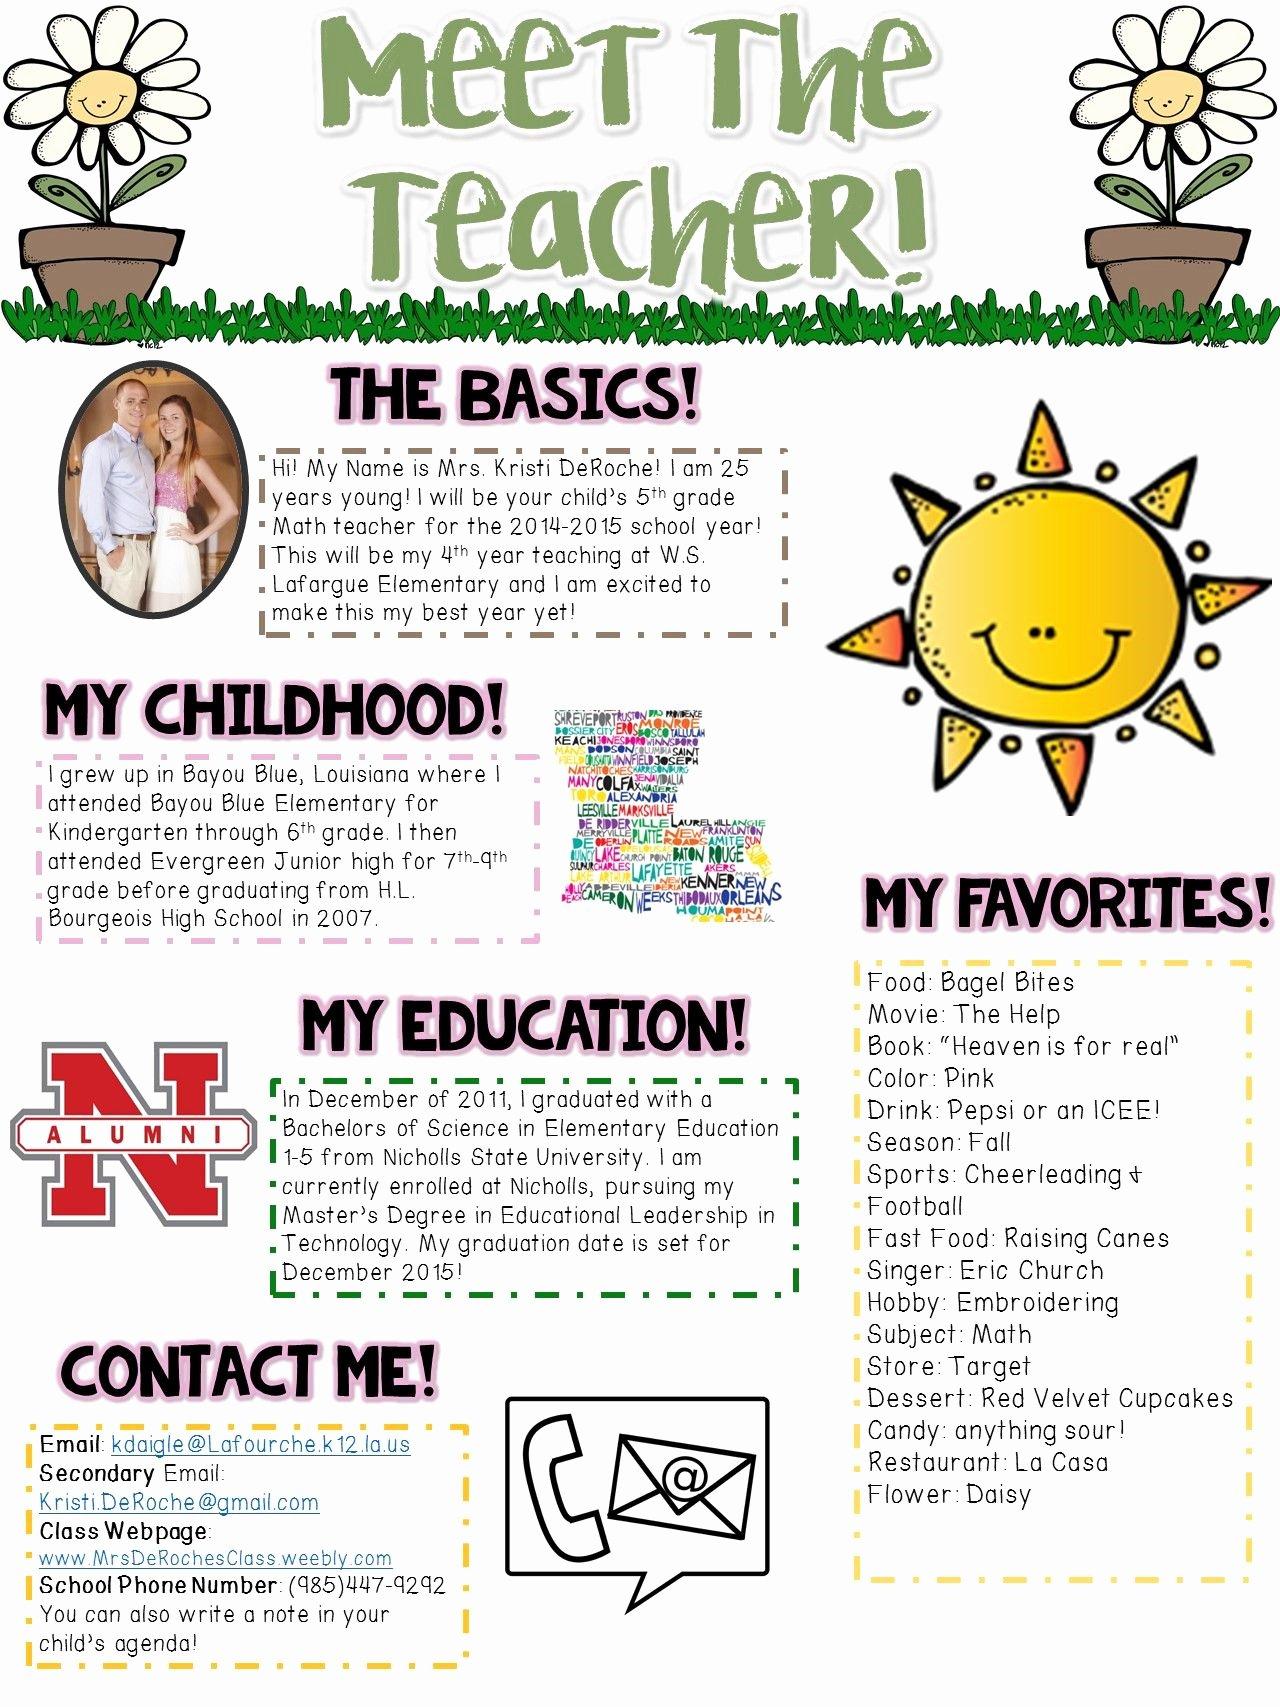 First Grade Newsletter Template Unique Meet the Teacher Newsletter Editable Spring theme